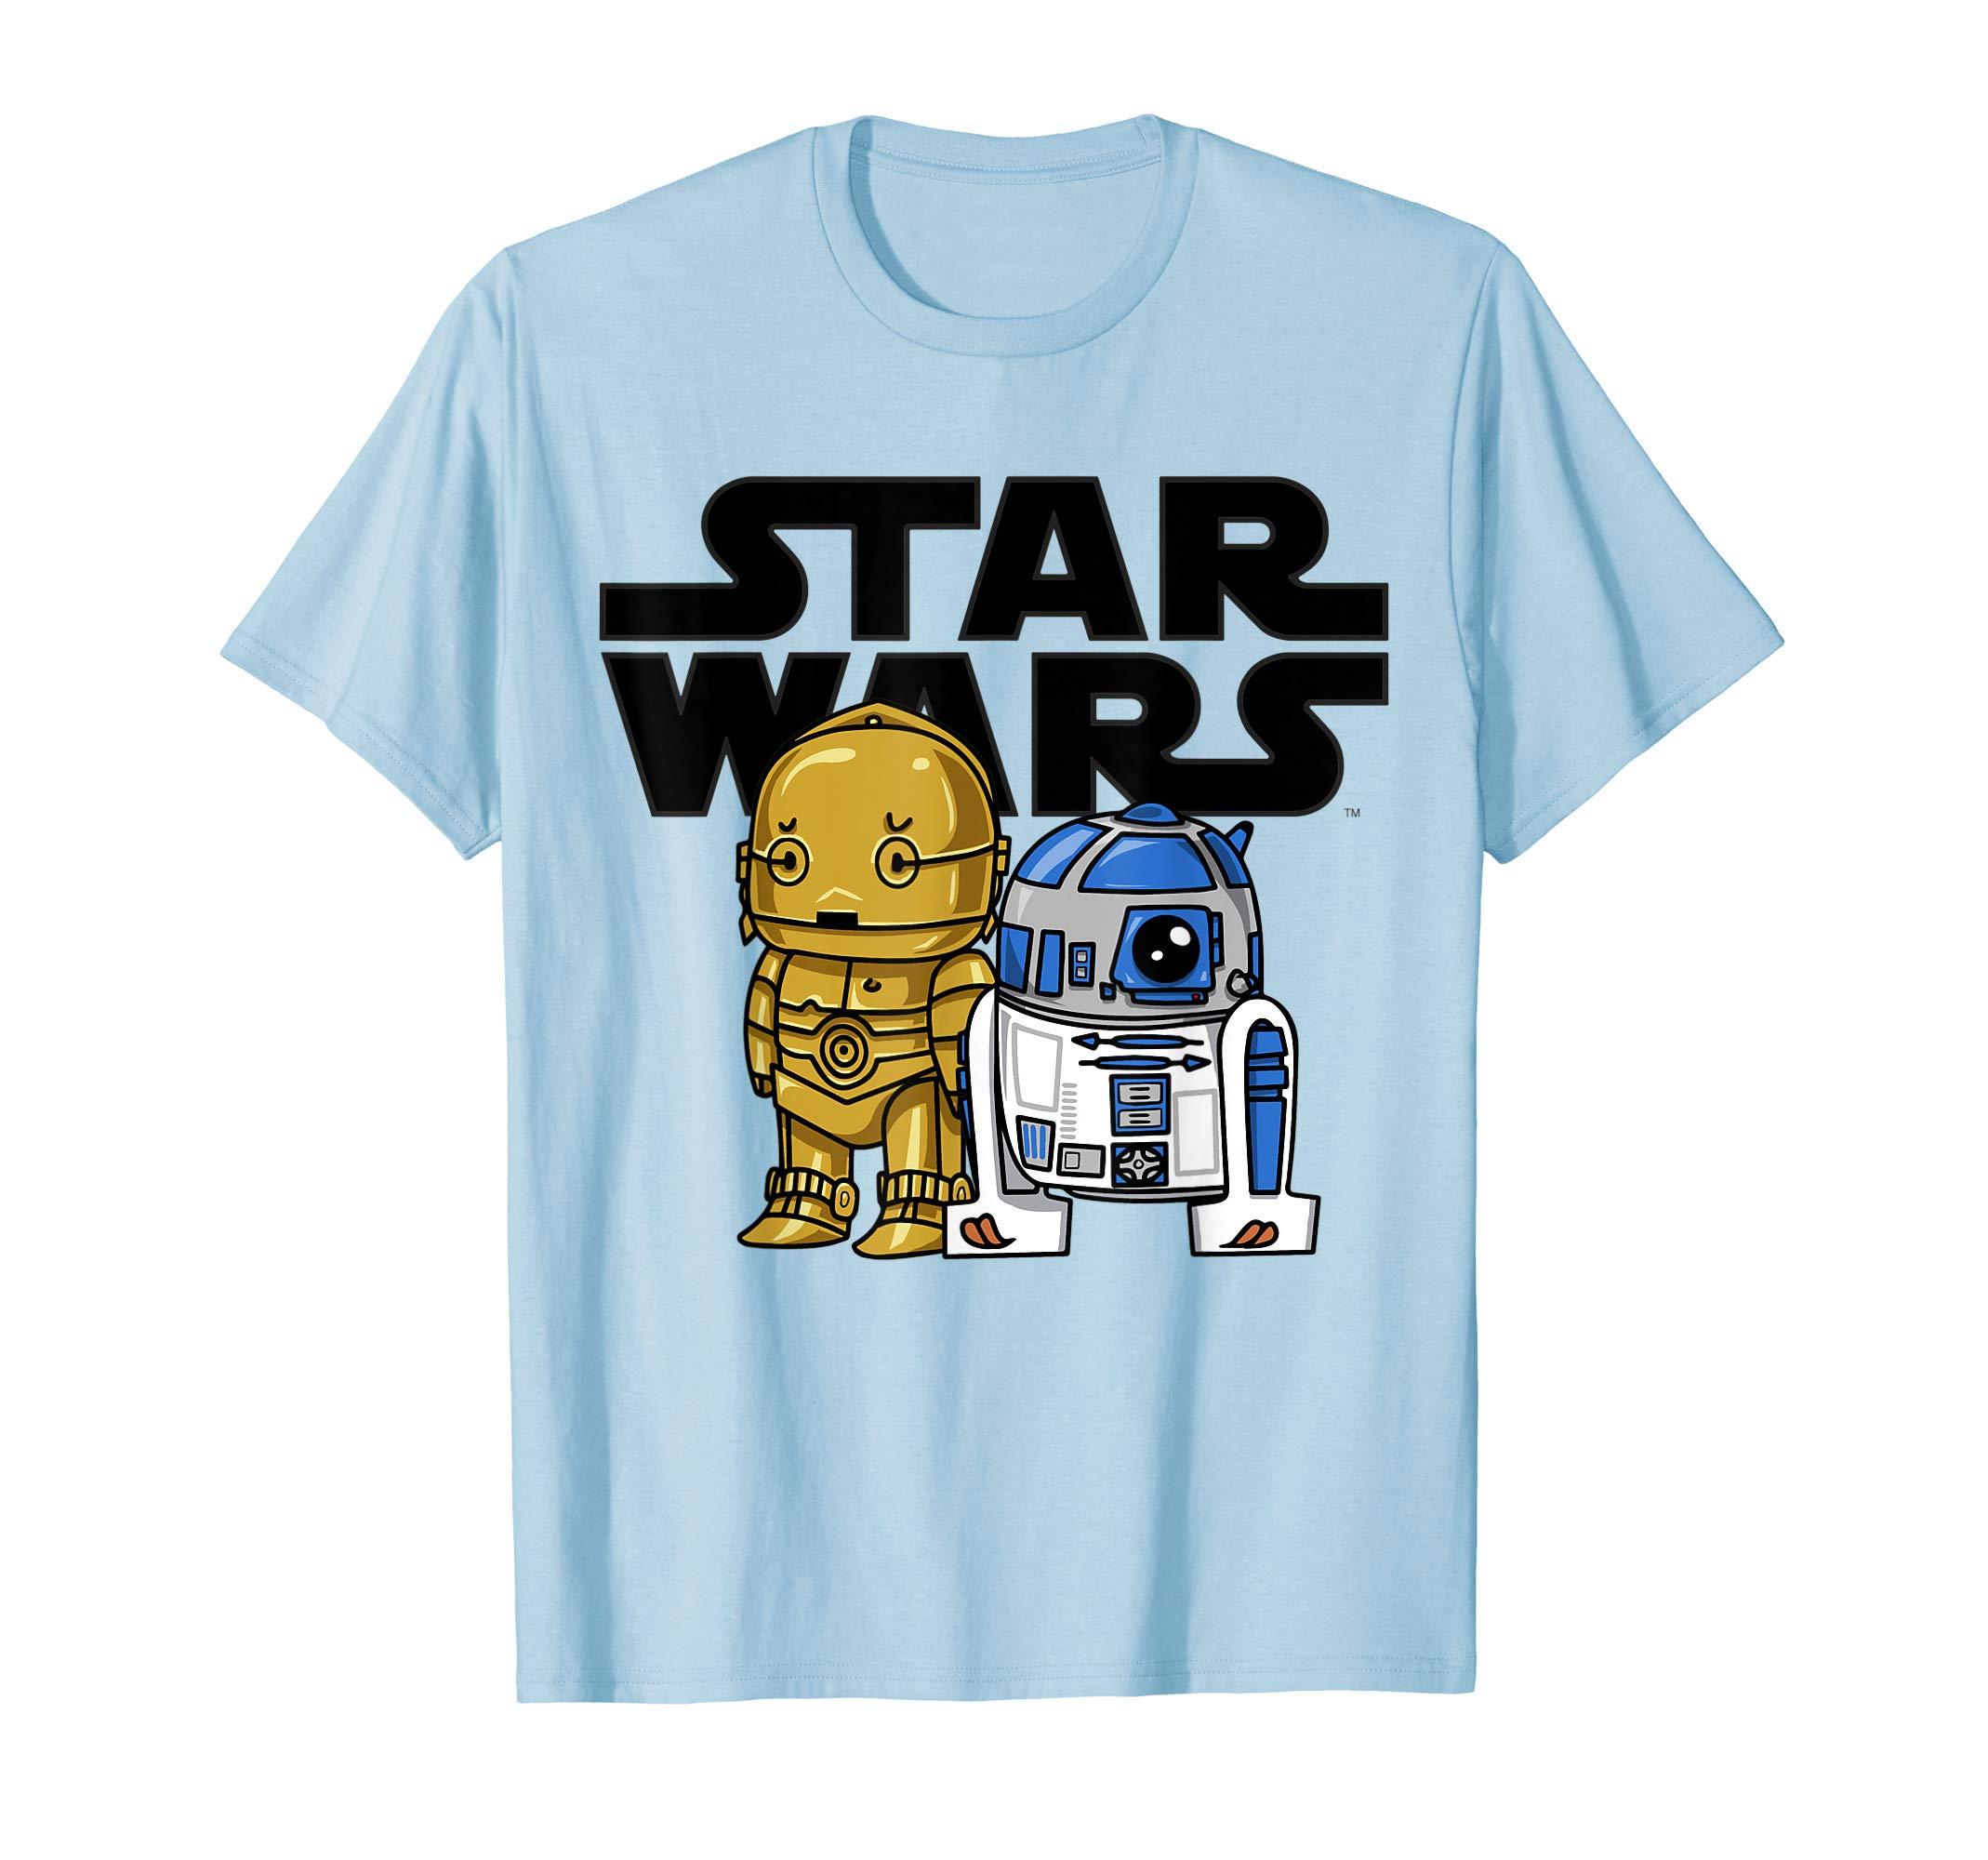 Star Wars Boba R2-D2 and C-3PO Cute Cartoon Graphic